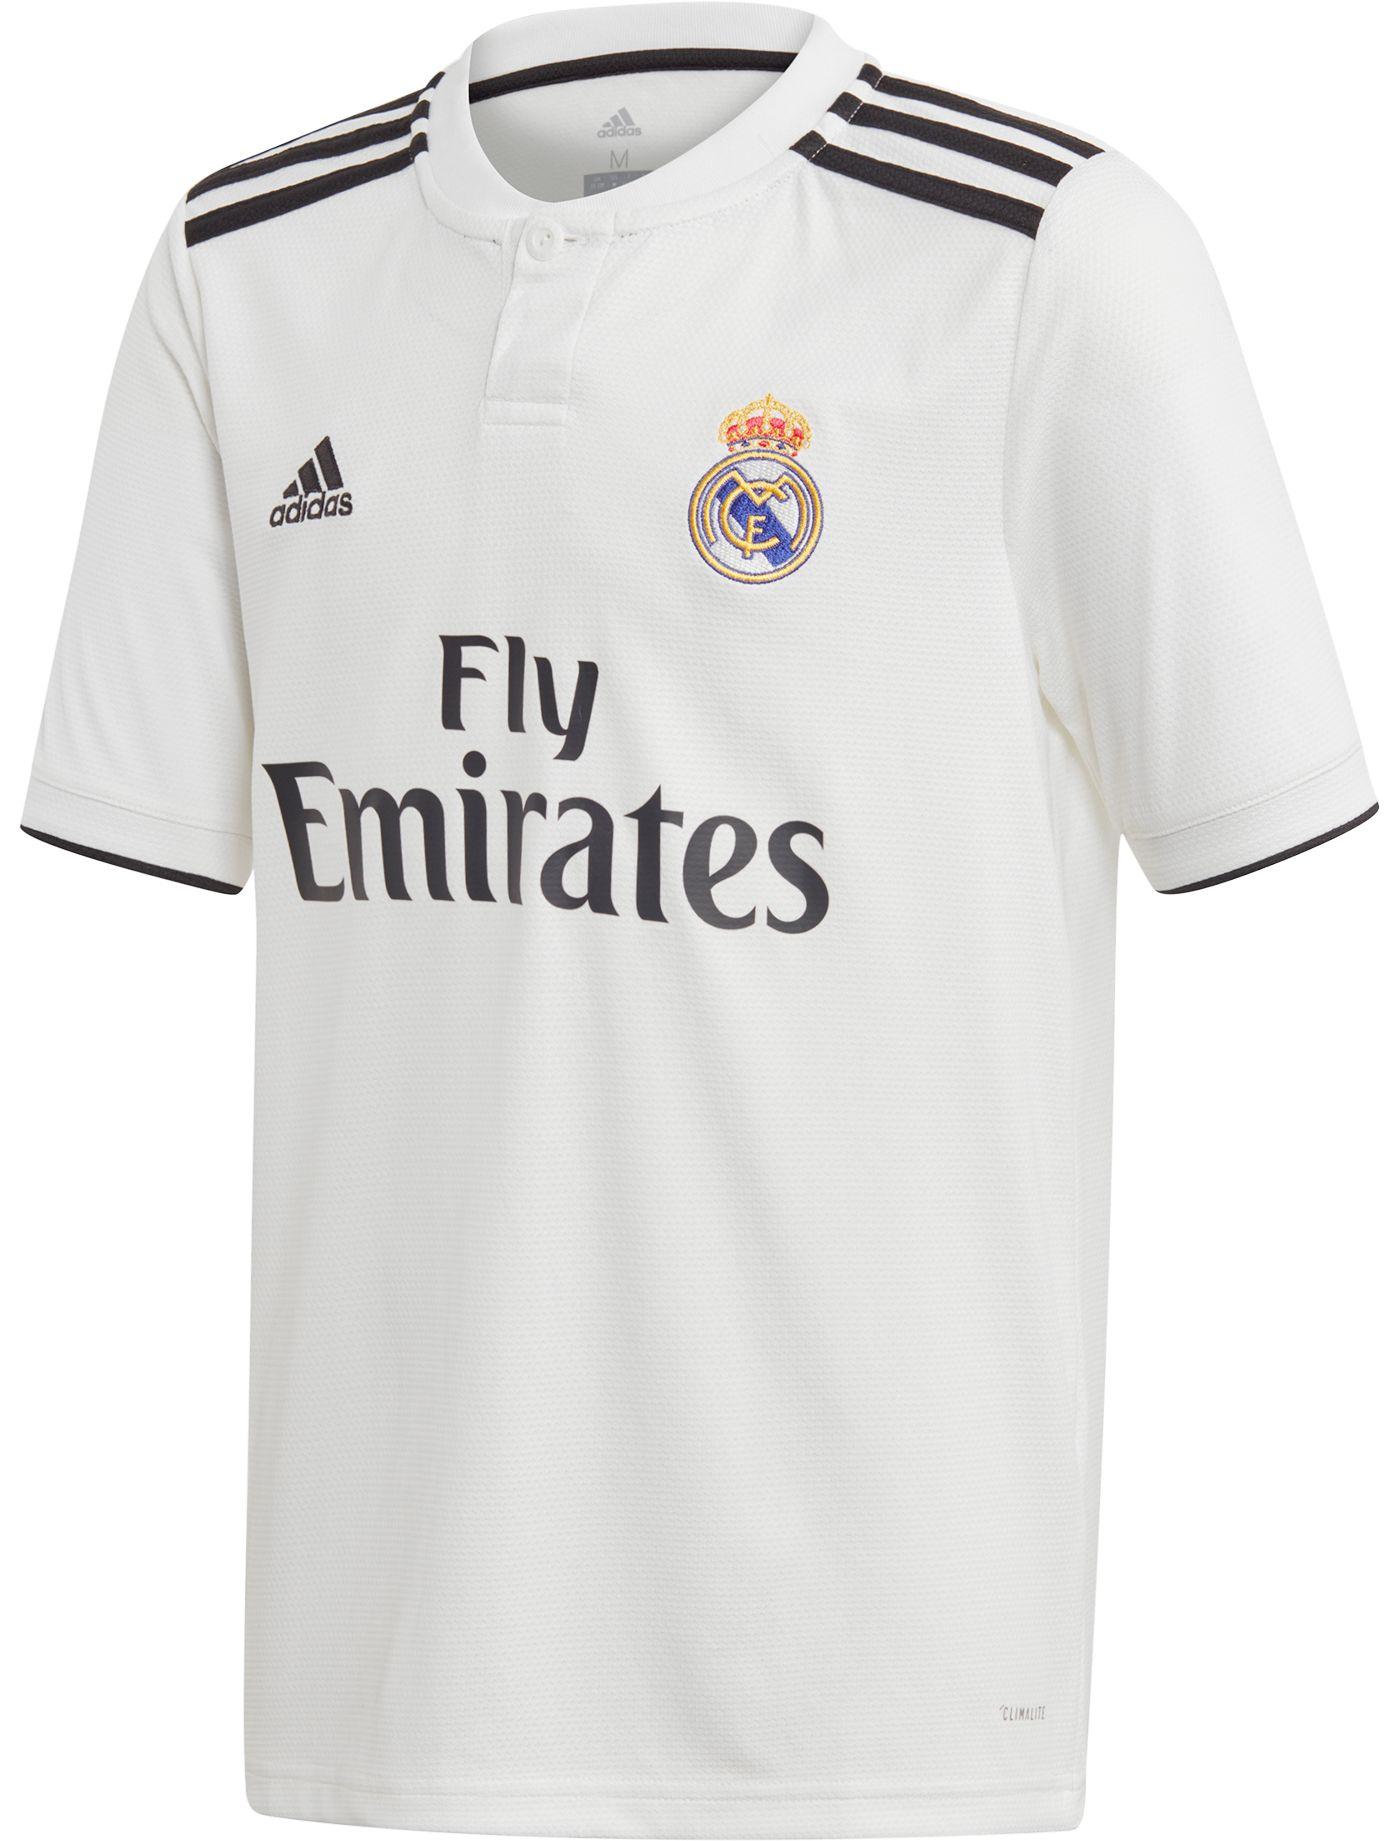 adidas Youth Real Madrid 2018 Stadium Home Replica Jersey